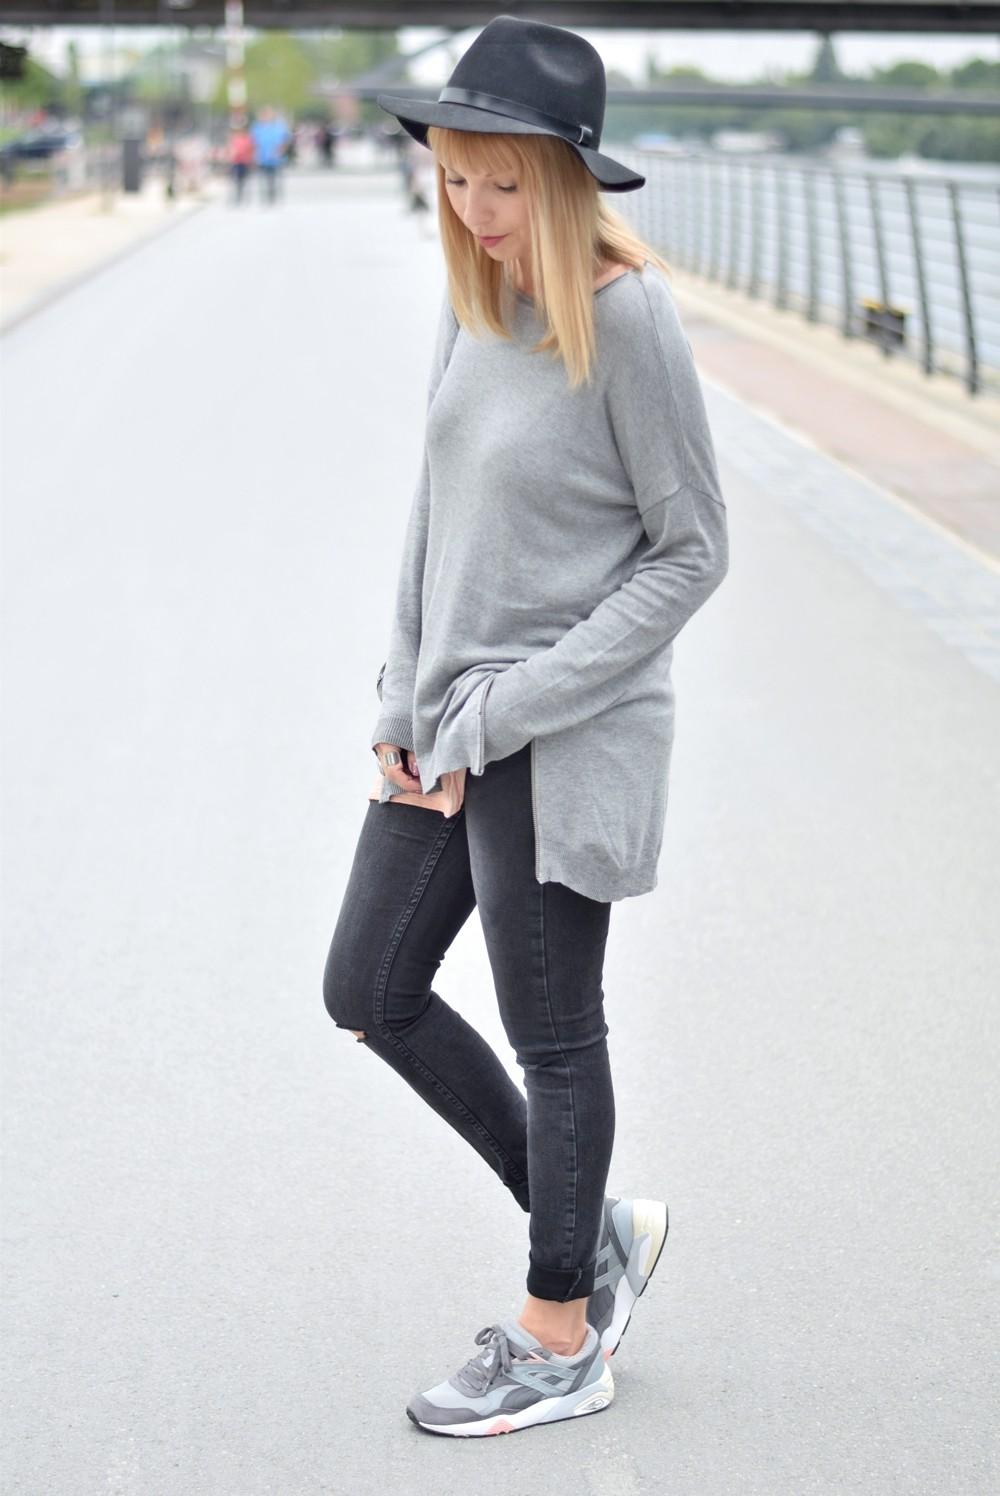 Puma Vashtie Outfit grau Jeans Sweater 14